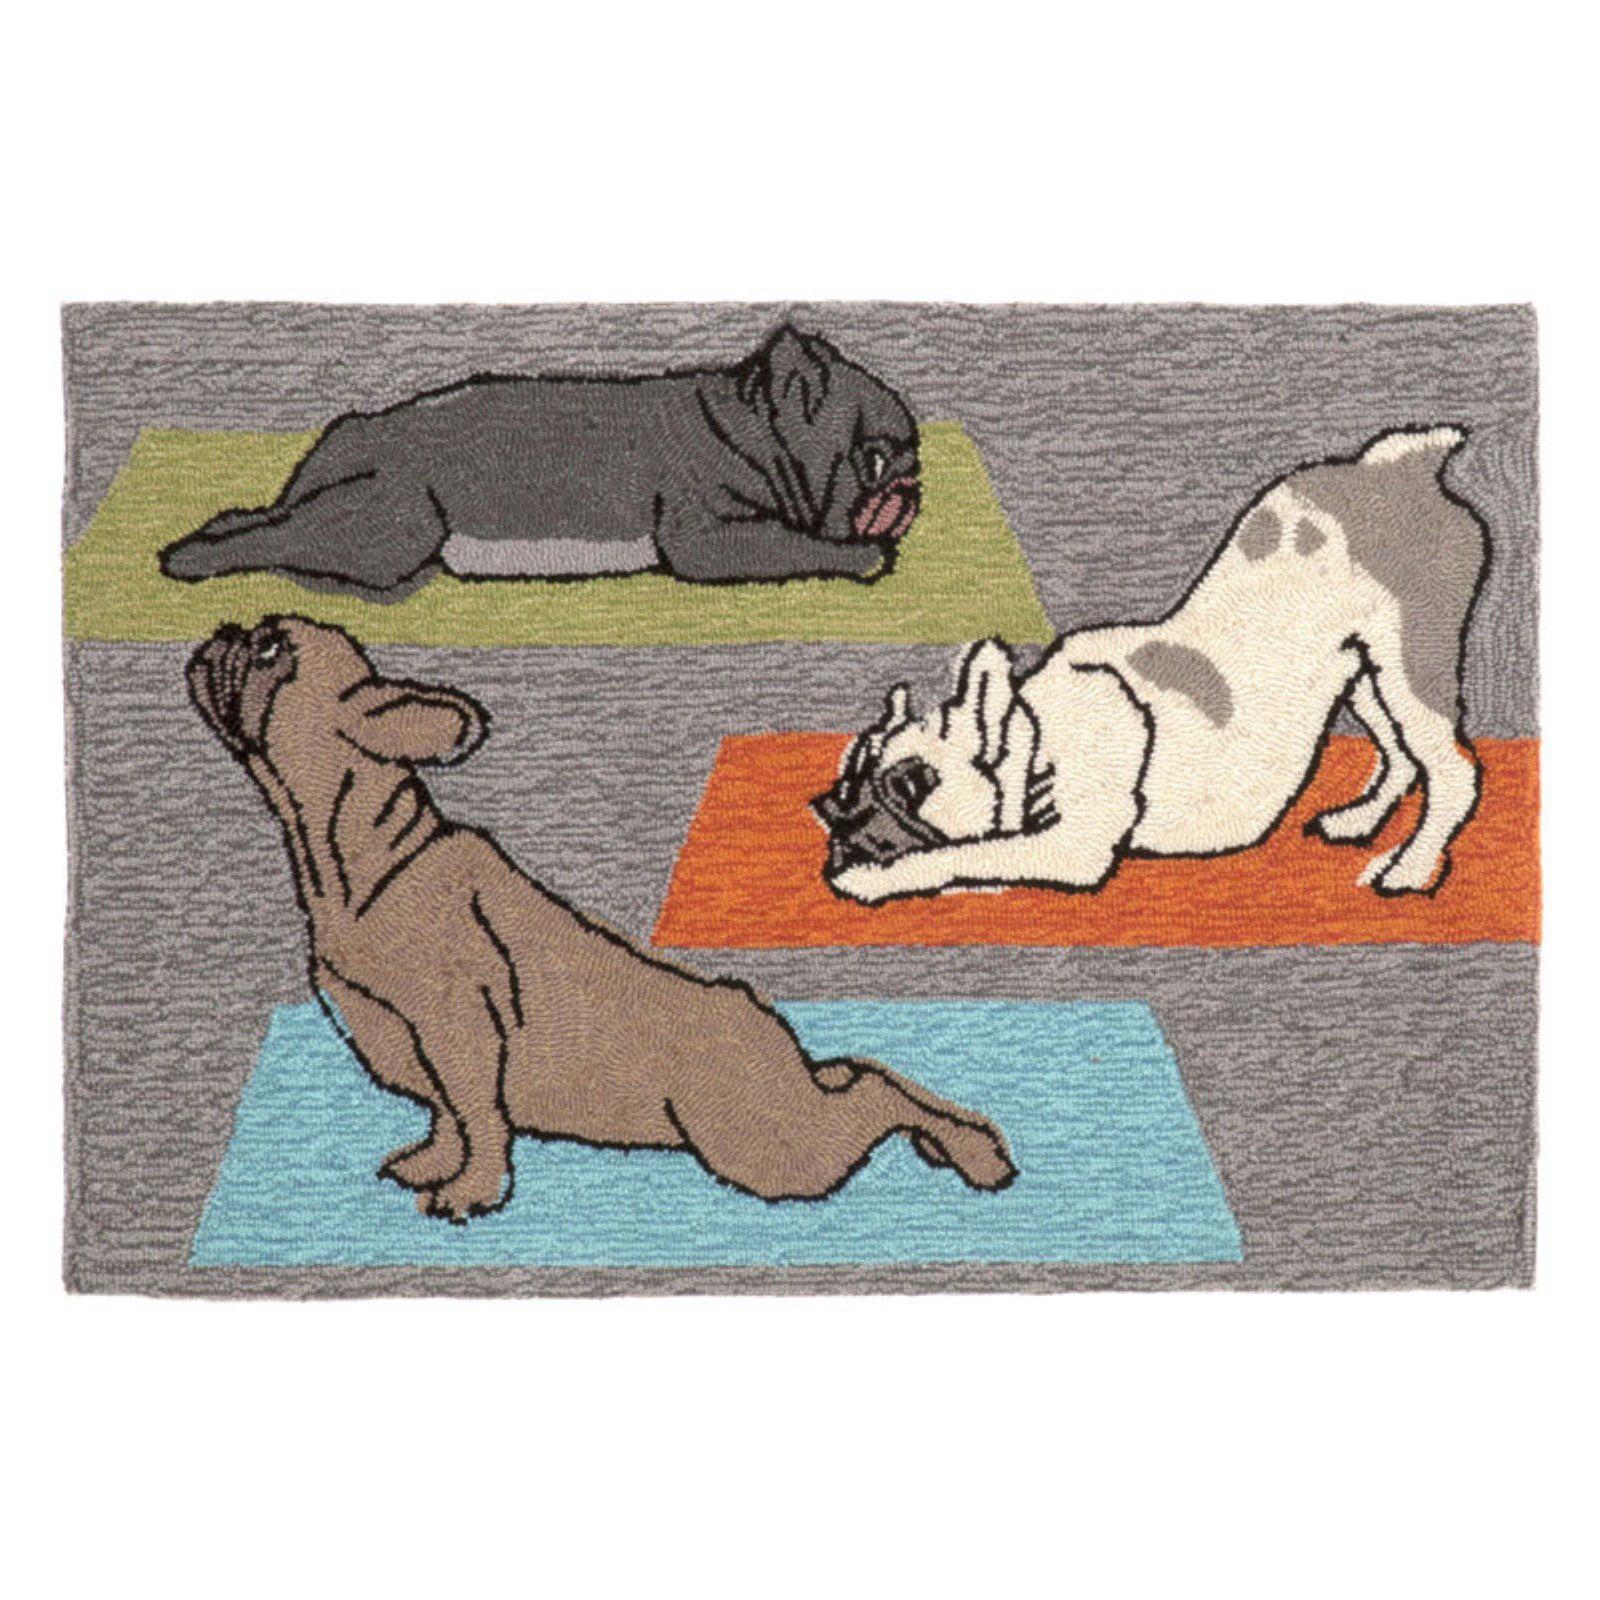 Trans-Ocean Rug Frontporch Yoga Dogs Doormat by Supplier Generic